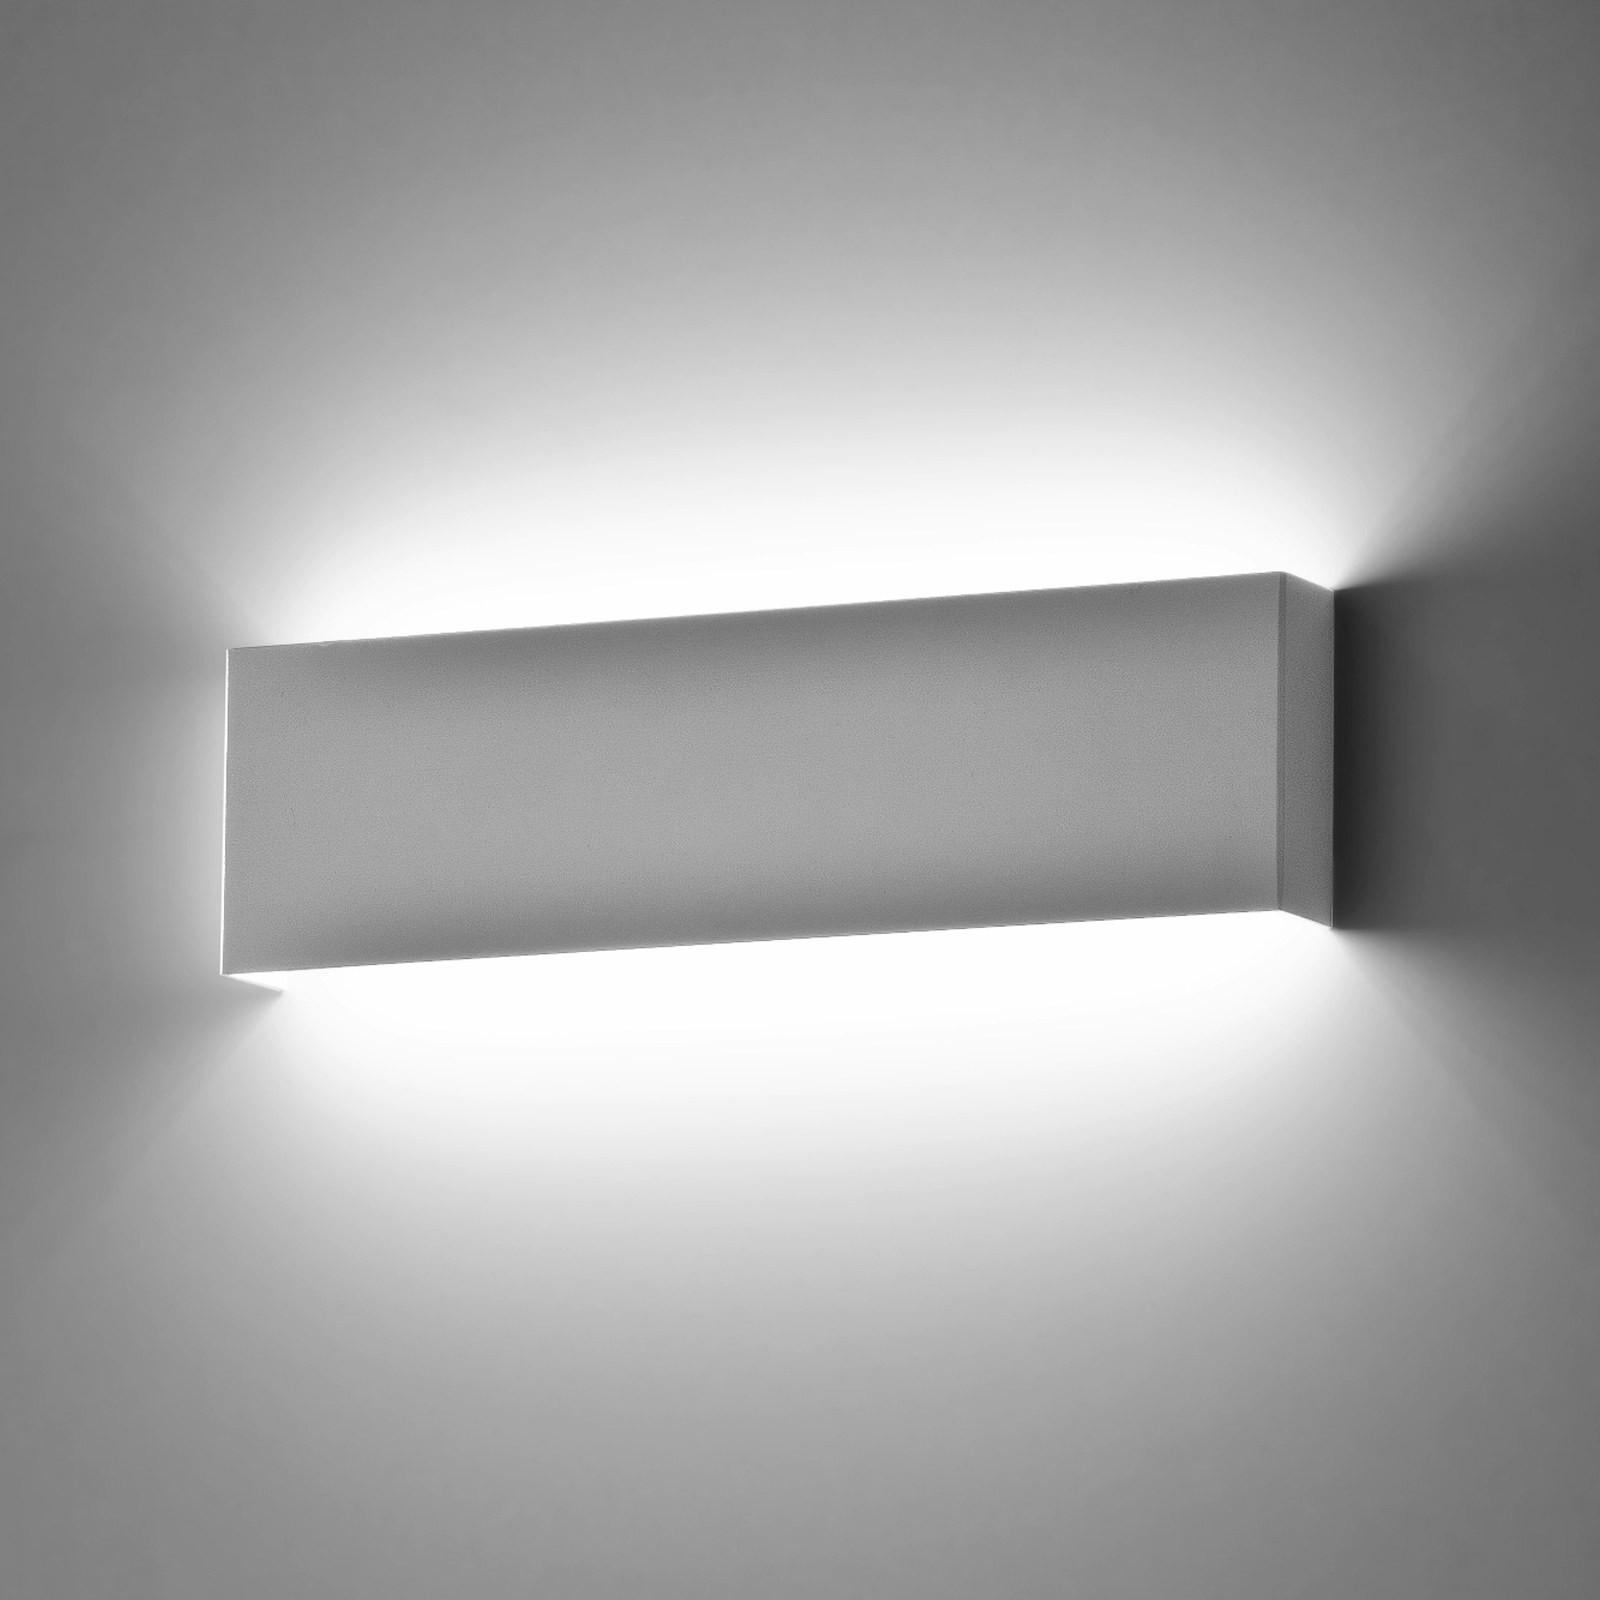 Applique lampada da parete a led moderno luce calda bianco design 18w isyluce area illumina - Lampade da parete design ...